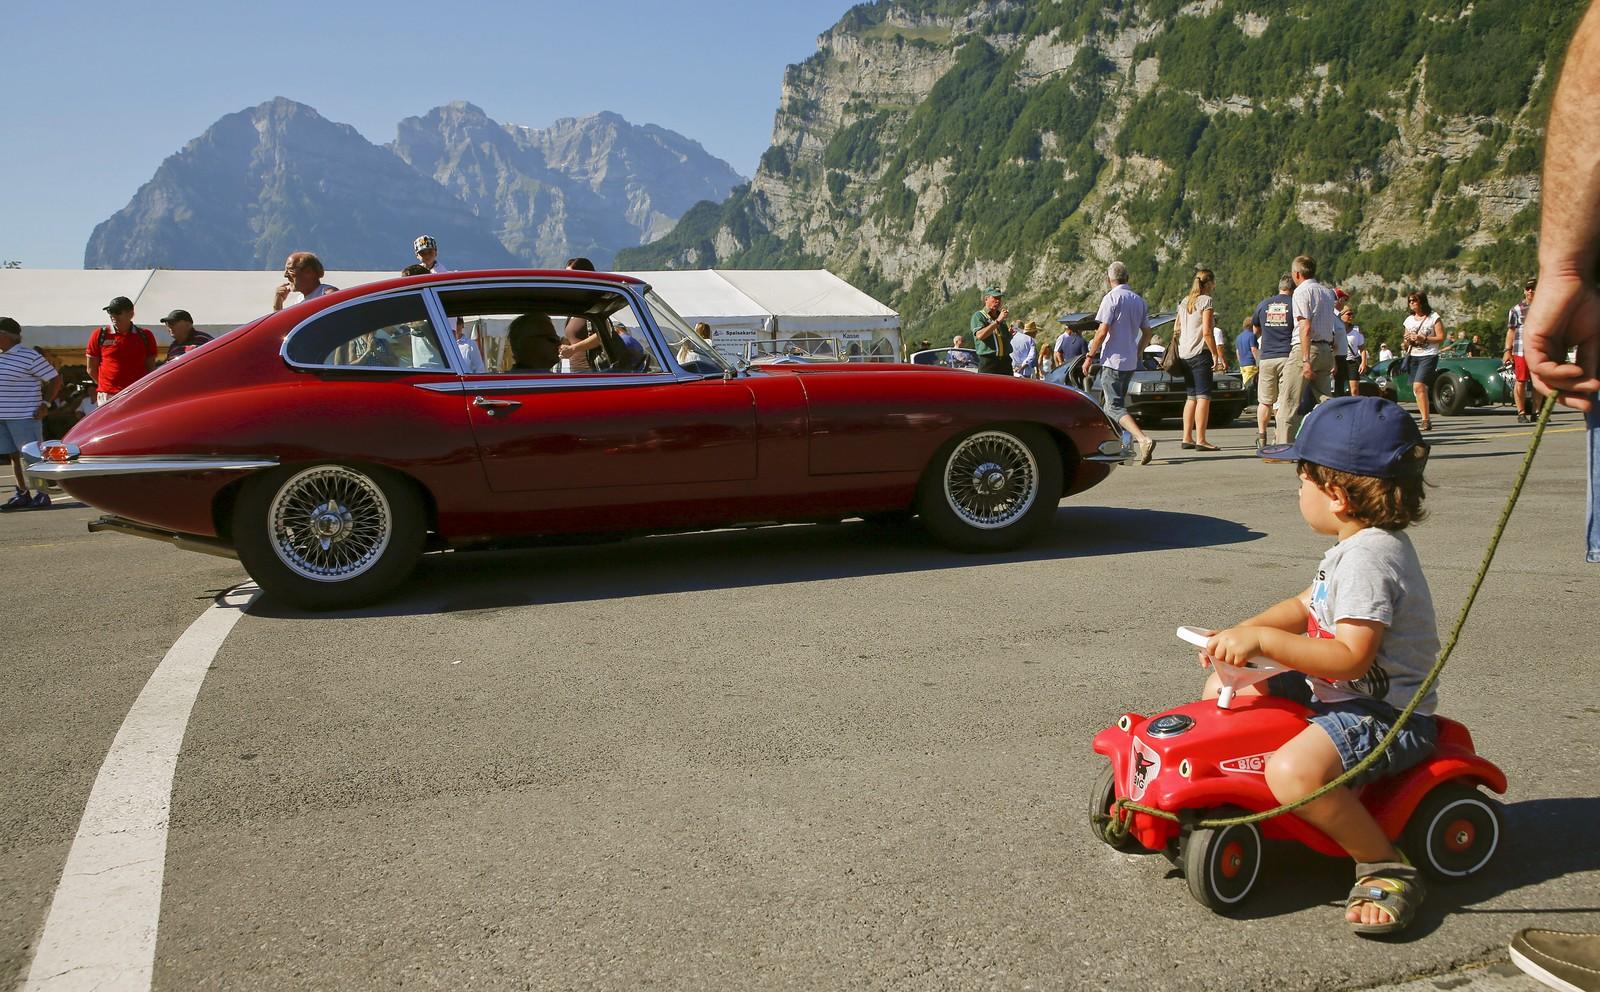 En liten gutt ser (drømmende) mot en Jaguar E-Type sportsbil under British Car Meeting 2015 i Mollis, Sveits. 1300 veteranbileiere var samla der denne uka.